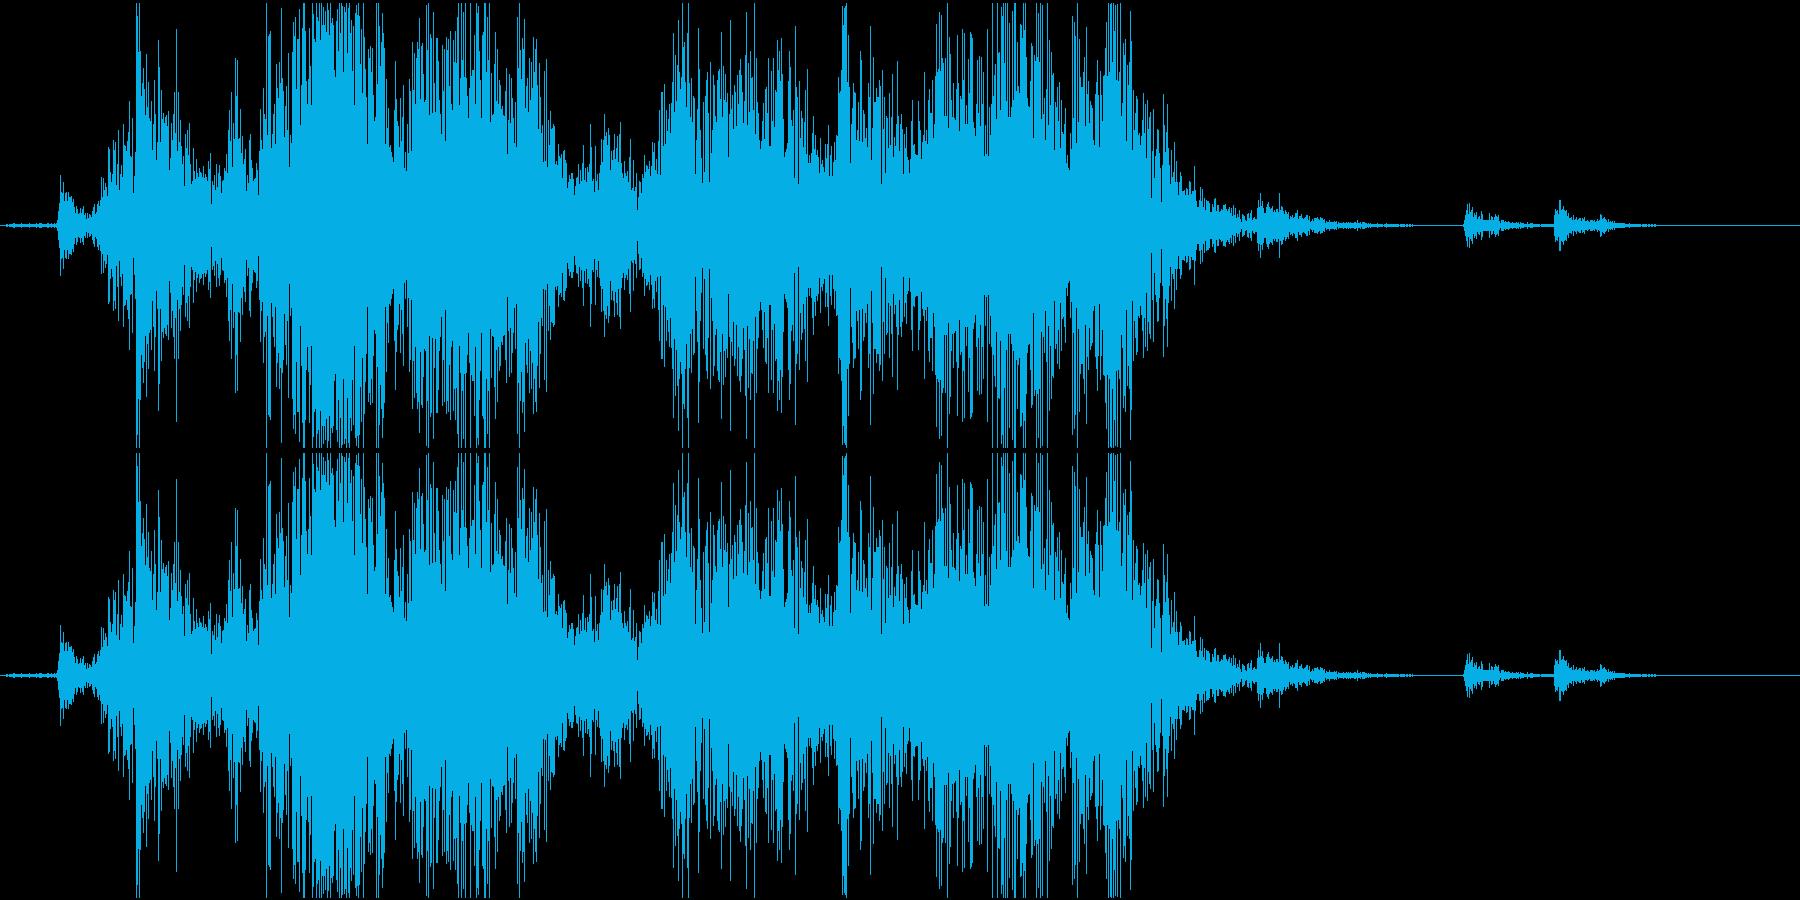 Material カトラリーボックスの音の再生済みの波形